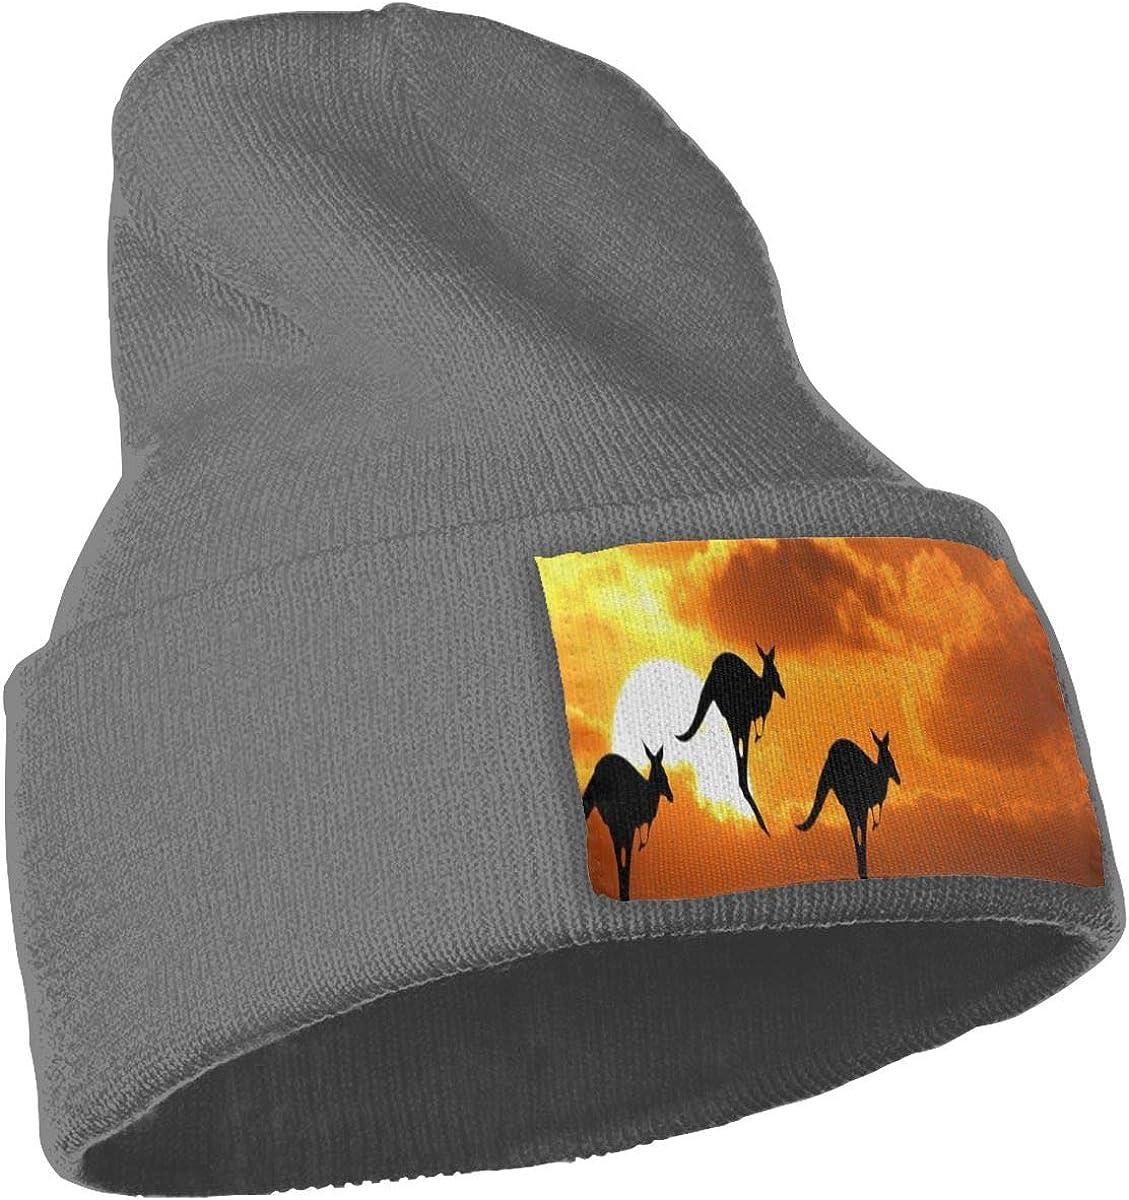 Kangaroo in Sunset Unisex Winter Knitting Woolen Hat Warm Cap